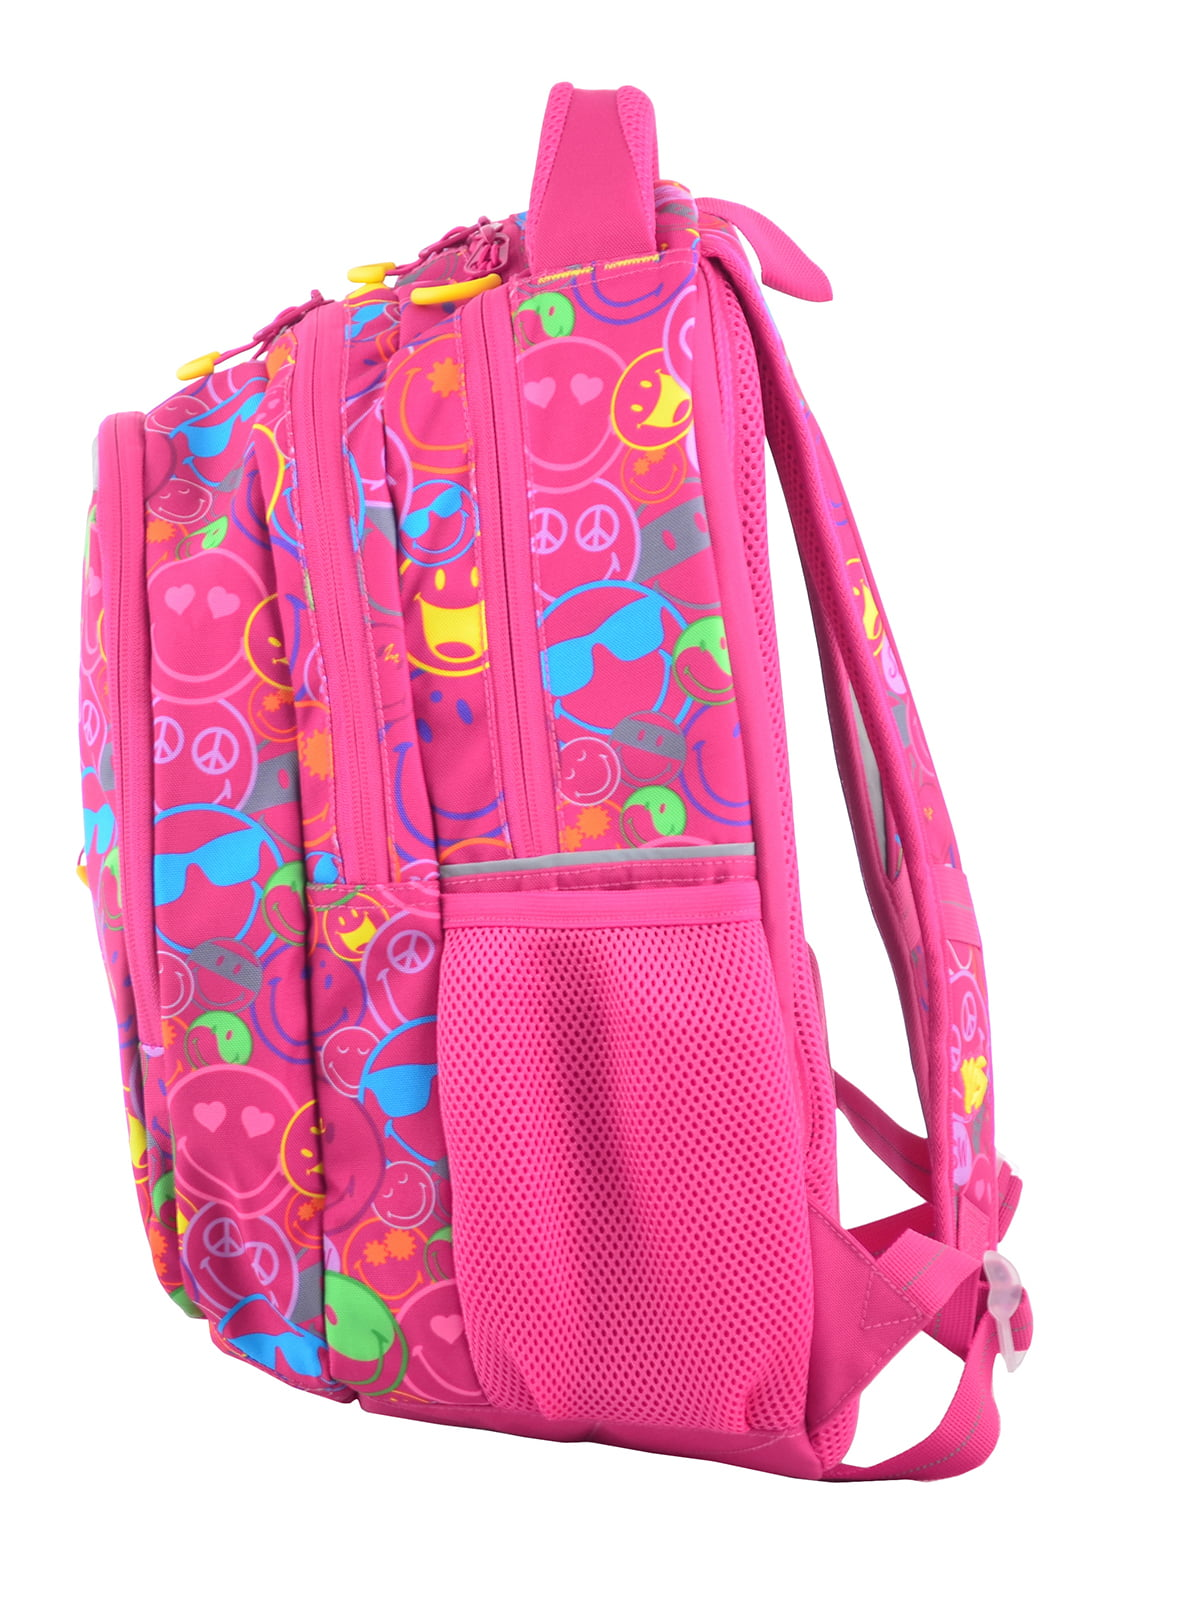 Рюкзак рожевий в принт | 4214930 | фото 3